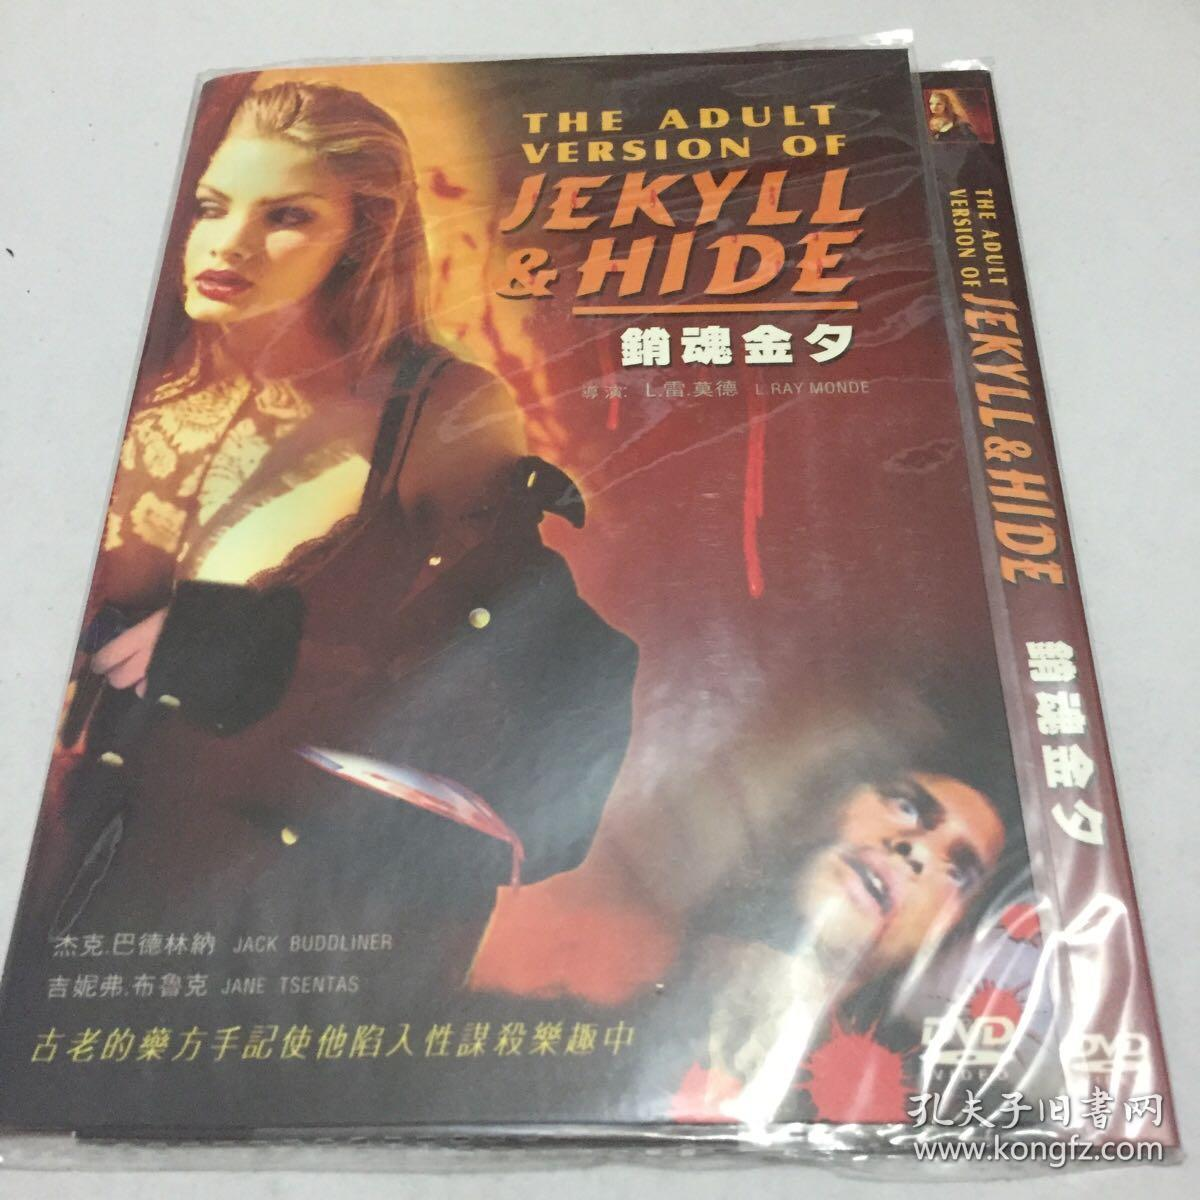 the adult version of jekyll &hide 销魂金夕 DVD